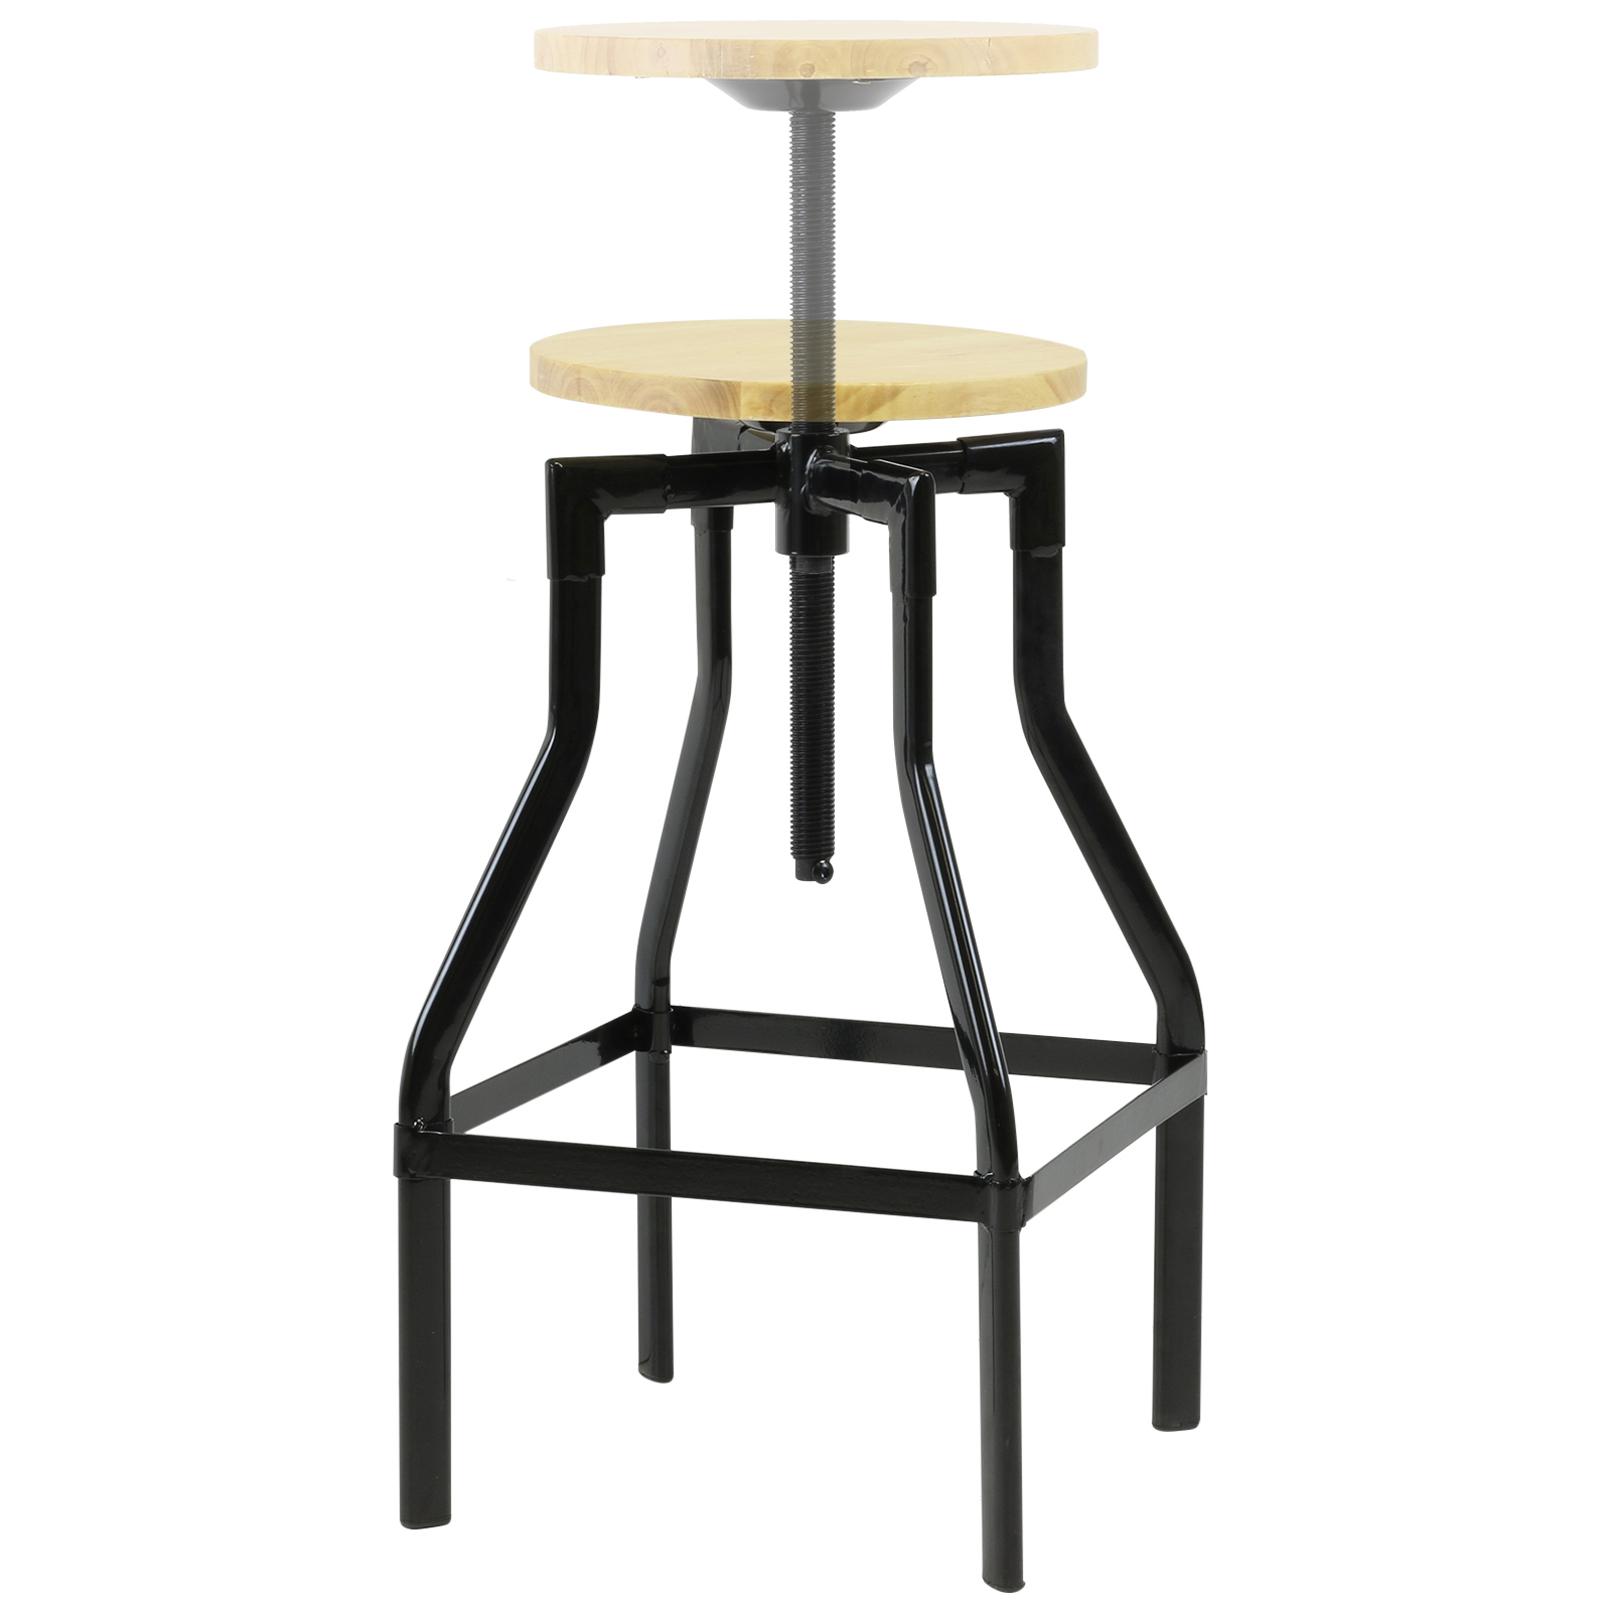 Hartleys tall retro swivel screw bar table stool big height adjustable wood seat ebay - Screw top bar stools ...